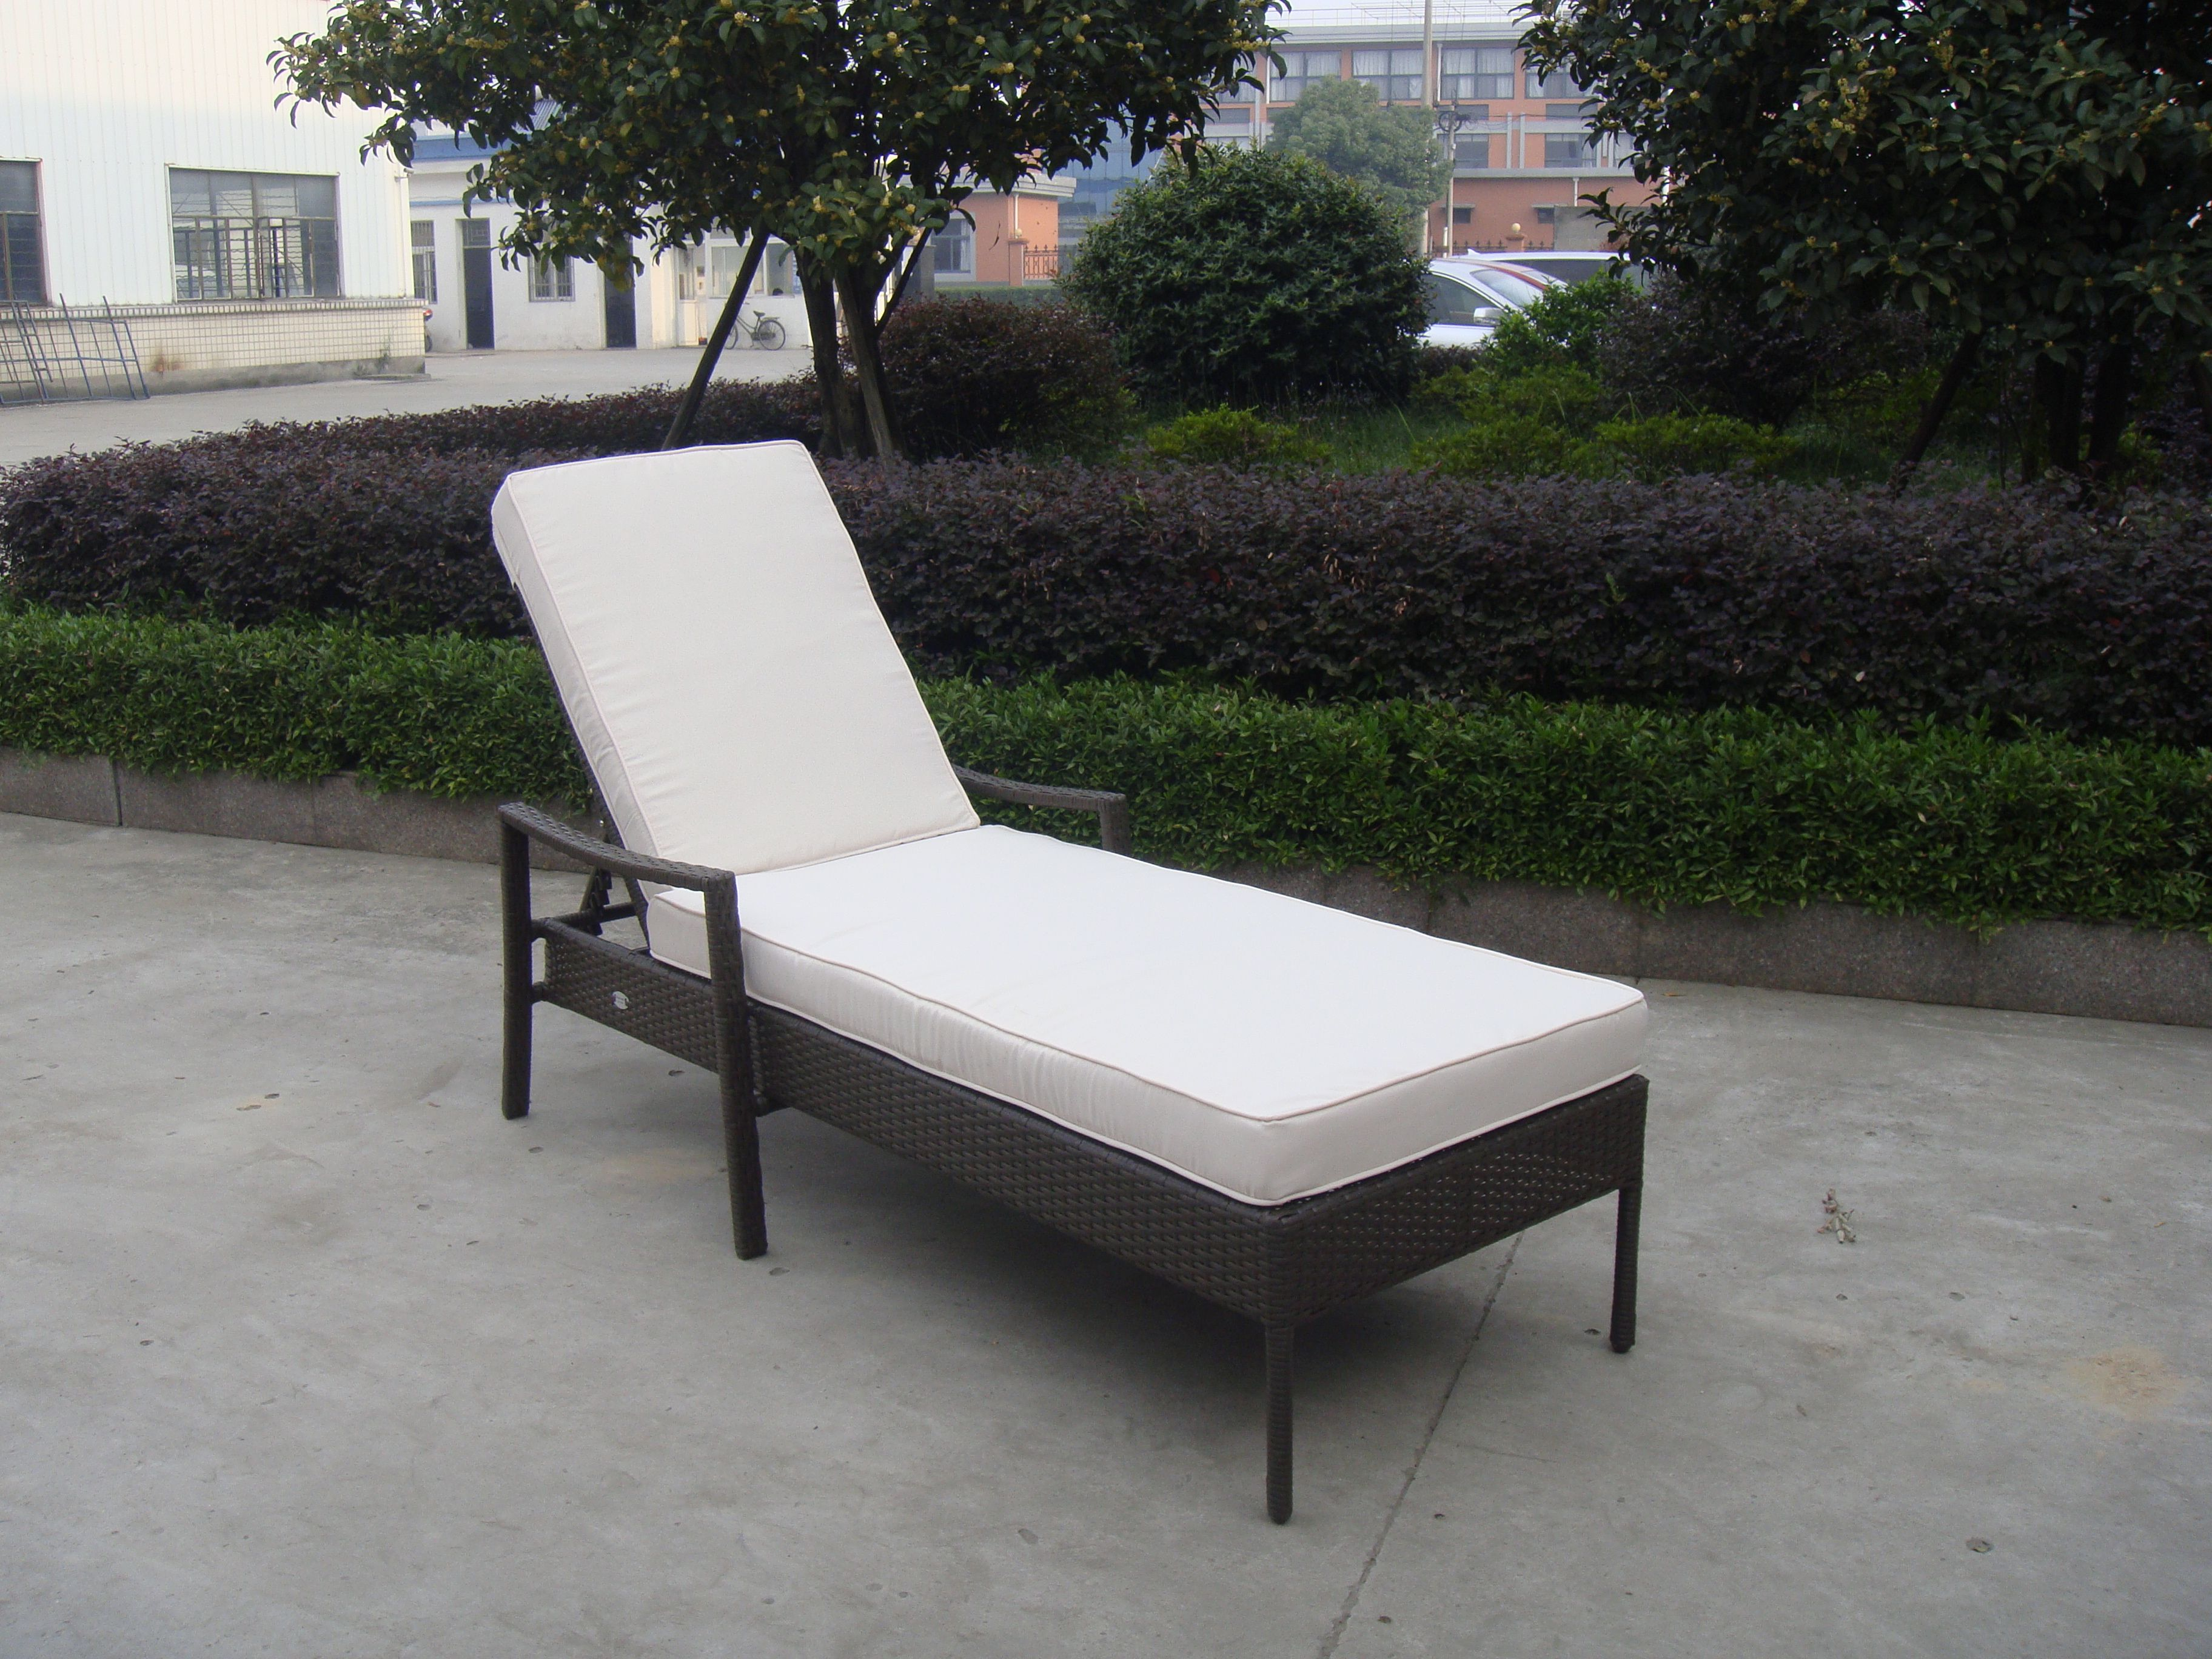 TG 7336 rattan sun lounger outdoor furniture